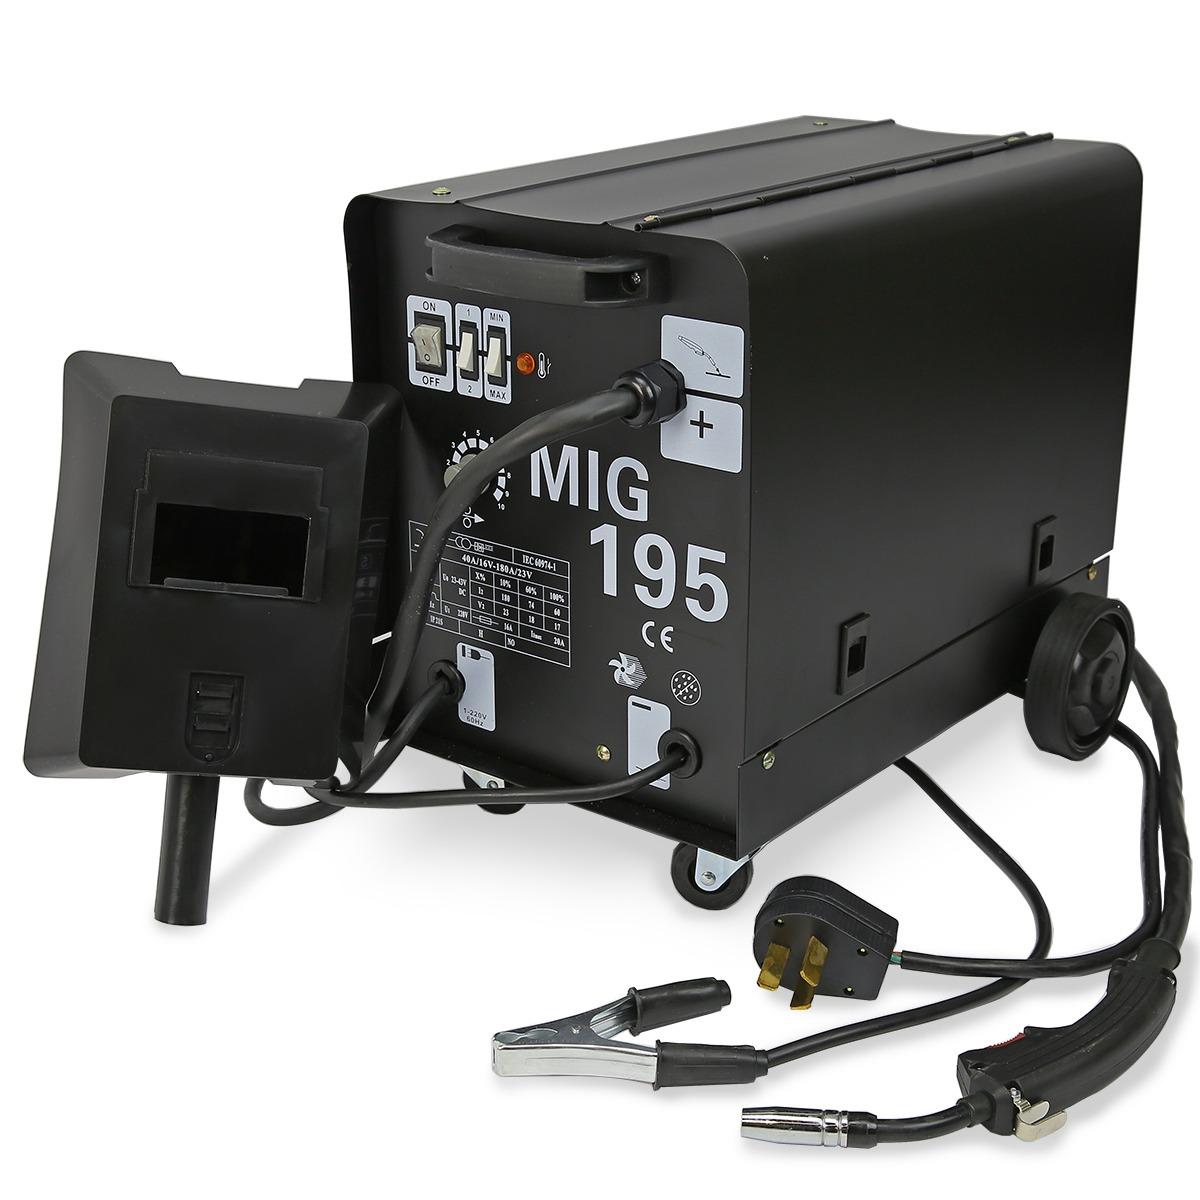 195 AMP DUAL MIG-195 230V Flux Core Auto Wire Welding Machine Gas No ...